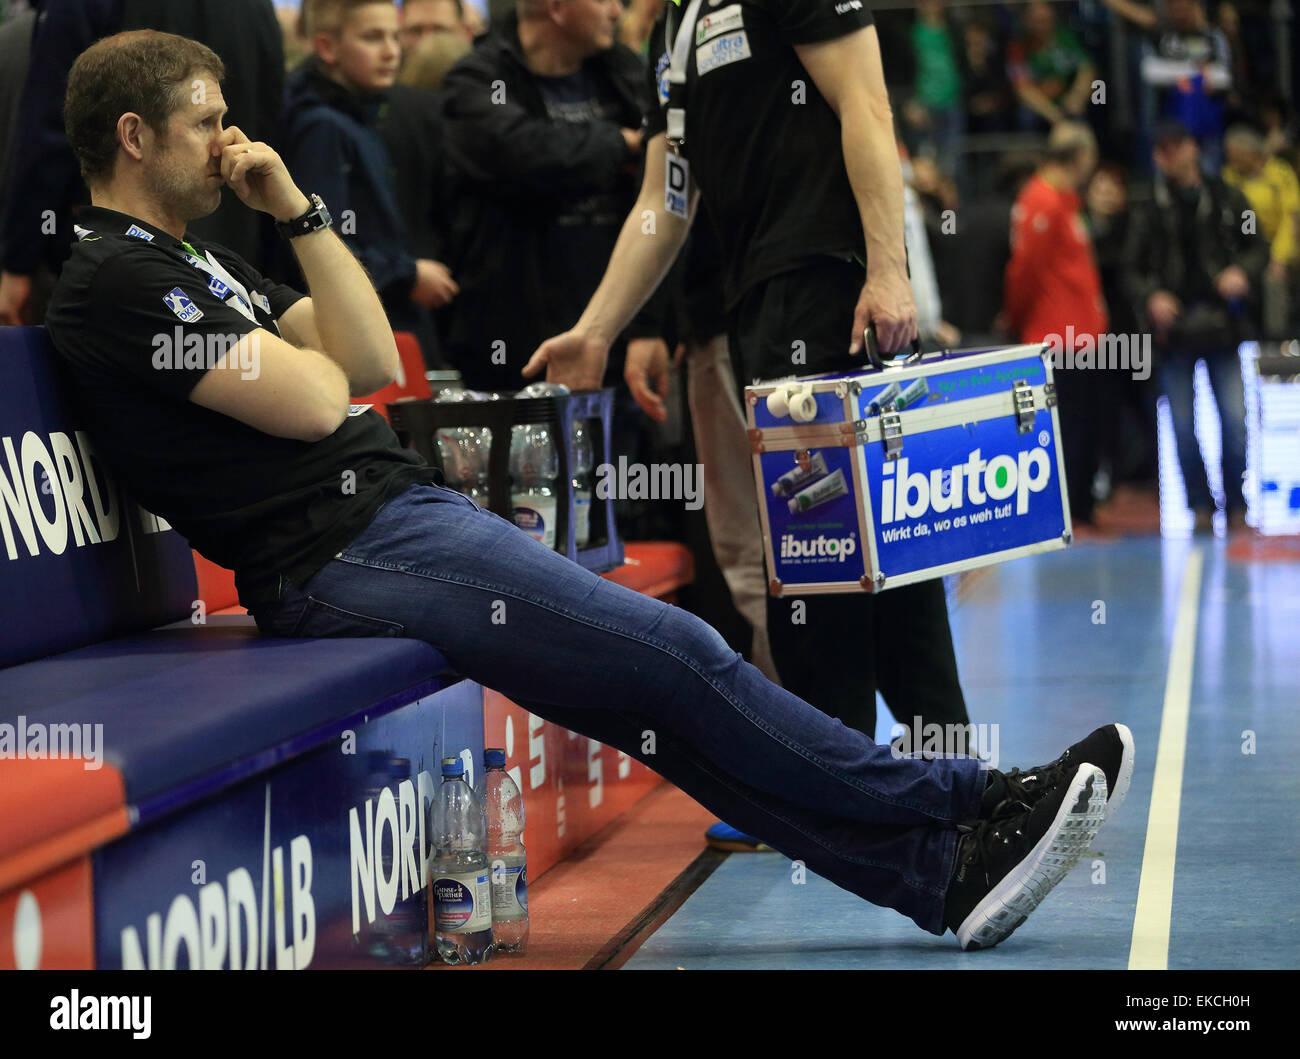 Magdeburg's coach Geir Sveinsson after the German handball bundesliga match between SC Magdeburg and THW Kiel - Stock Image